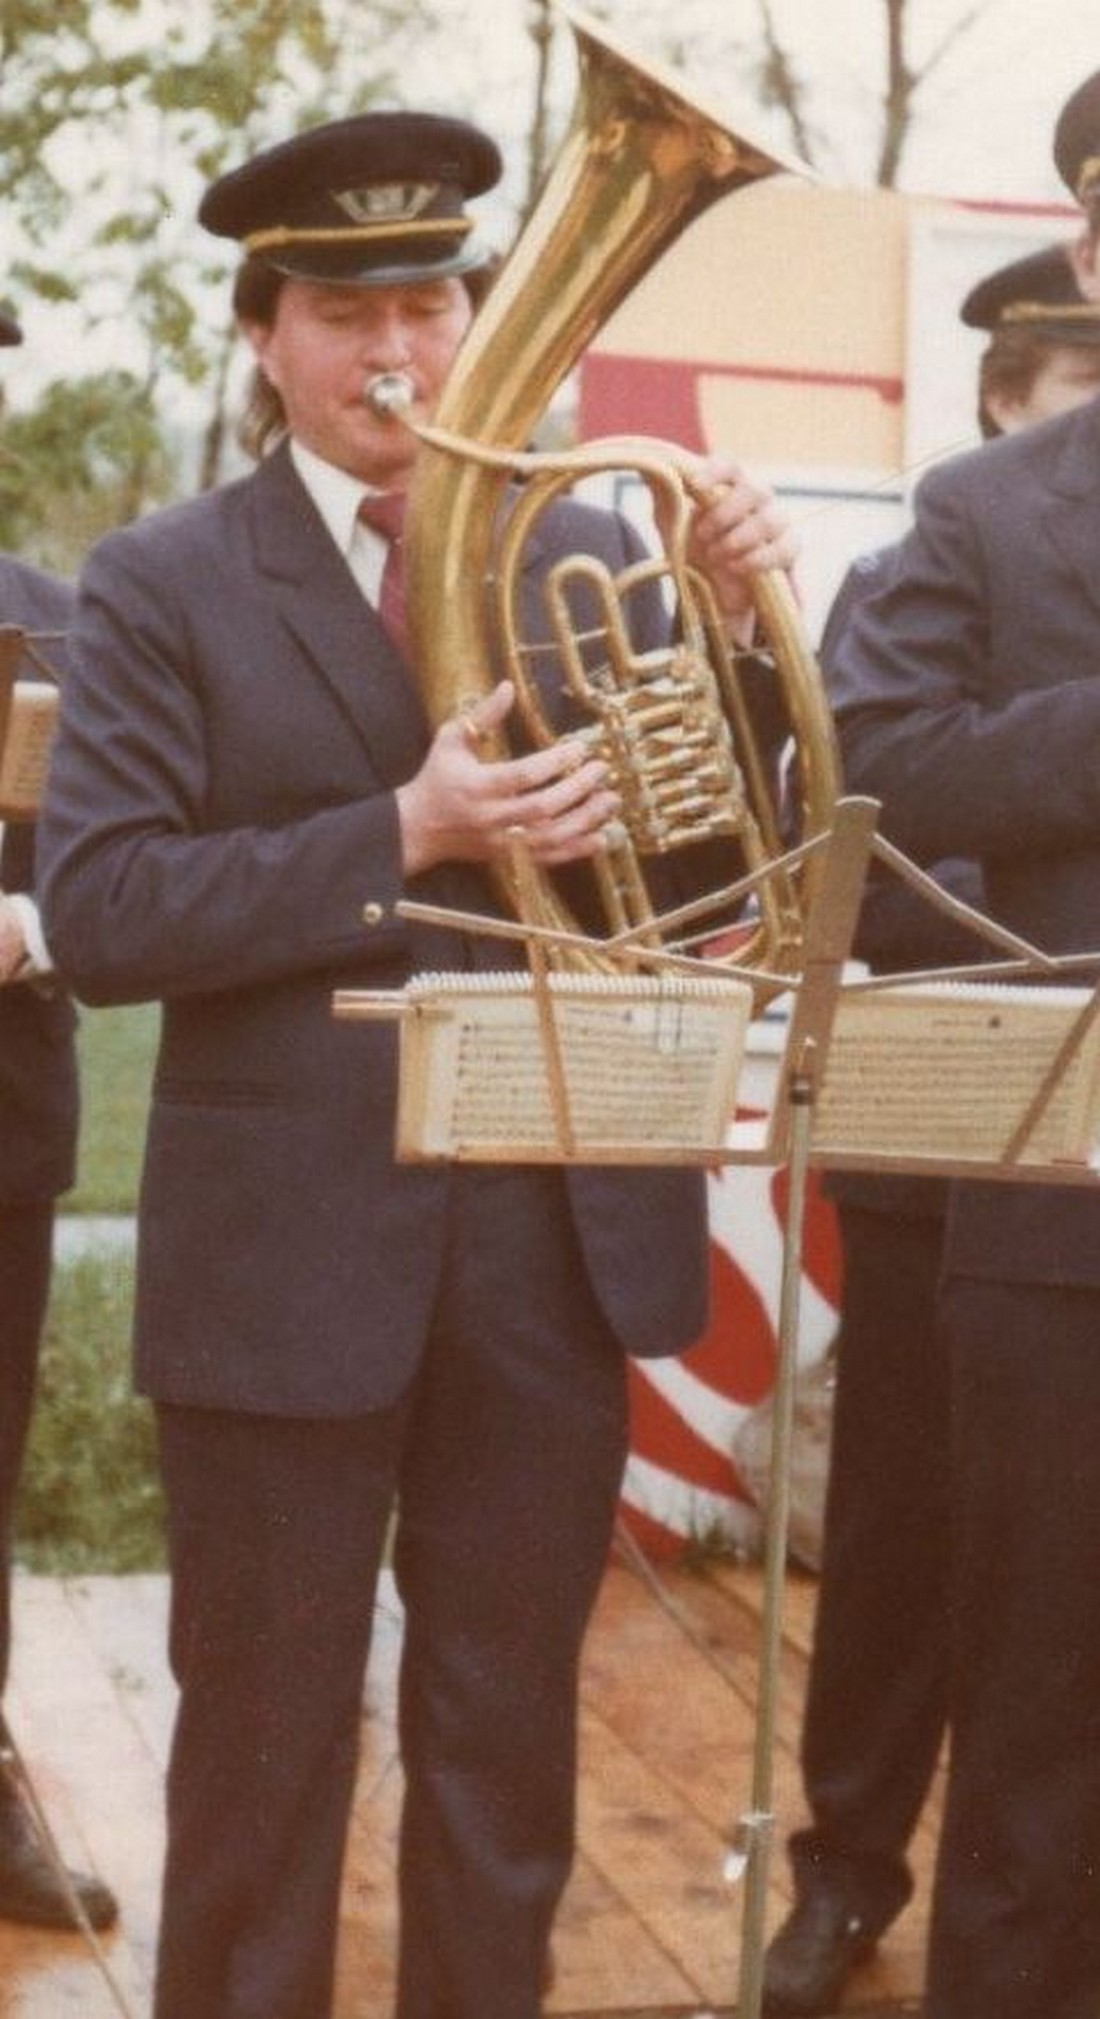 Peter Mrúz